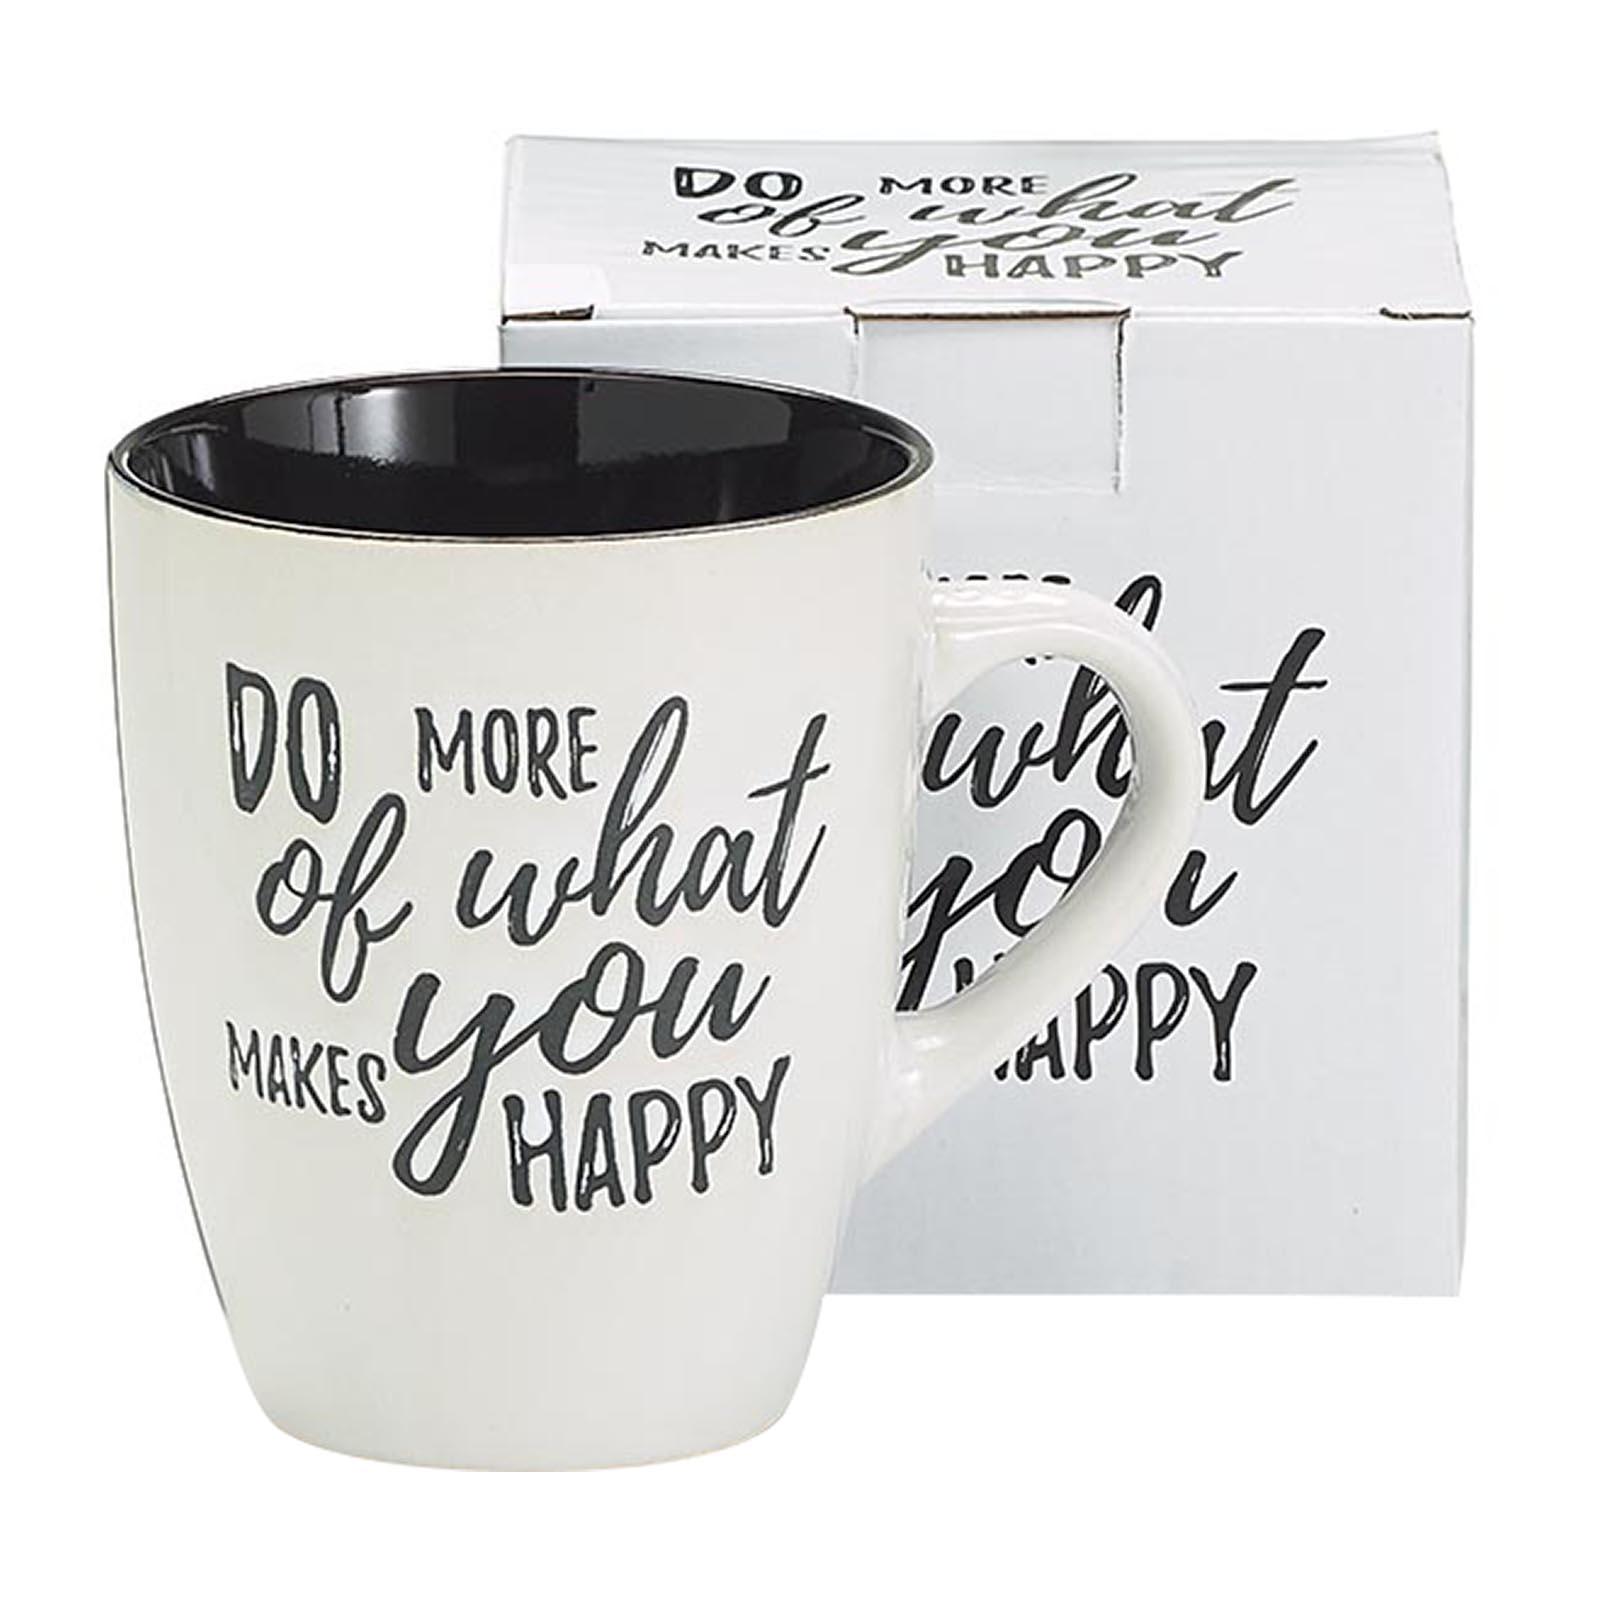 Burton & Burton 14 Oz Mug - Do More Of What Makes U Happy